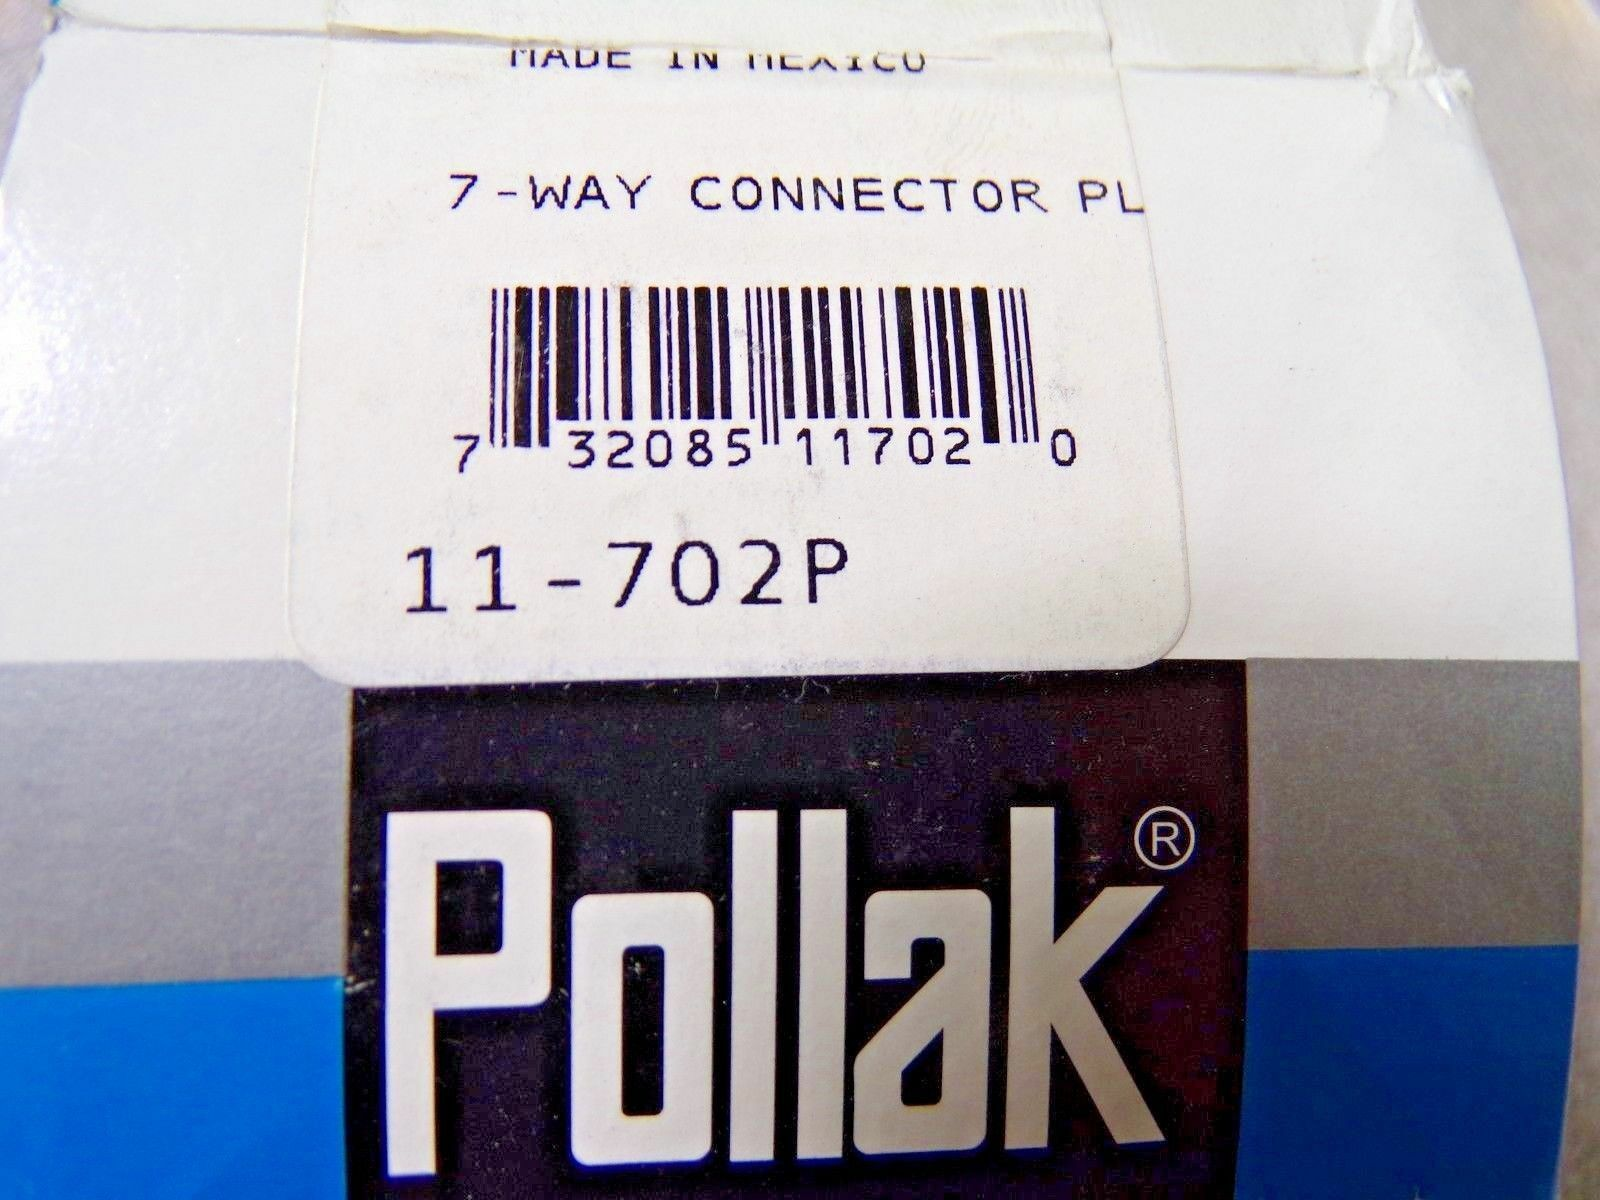 Pollak 7-Way Male Plug Item # 9JH64 Mfr. Model # 11 702P (MG)